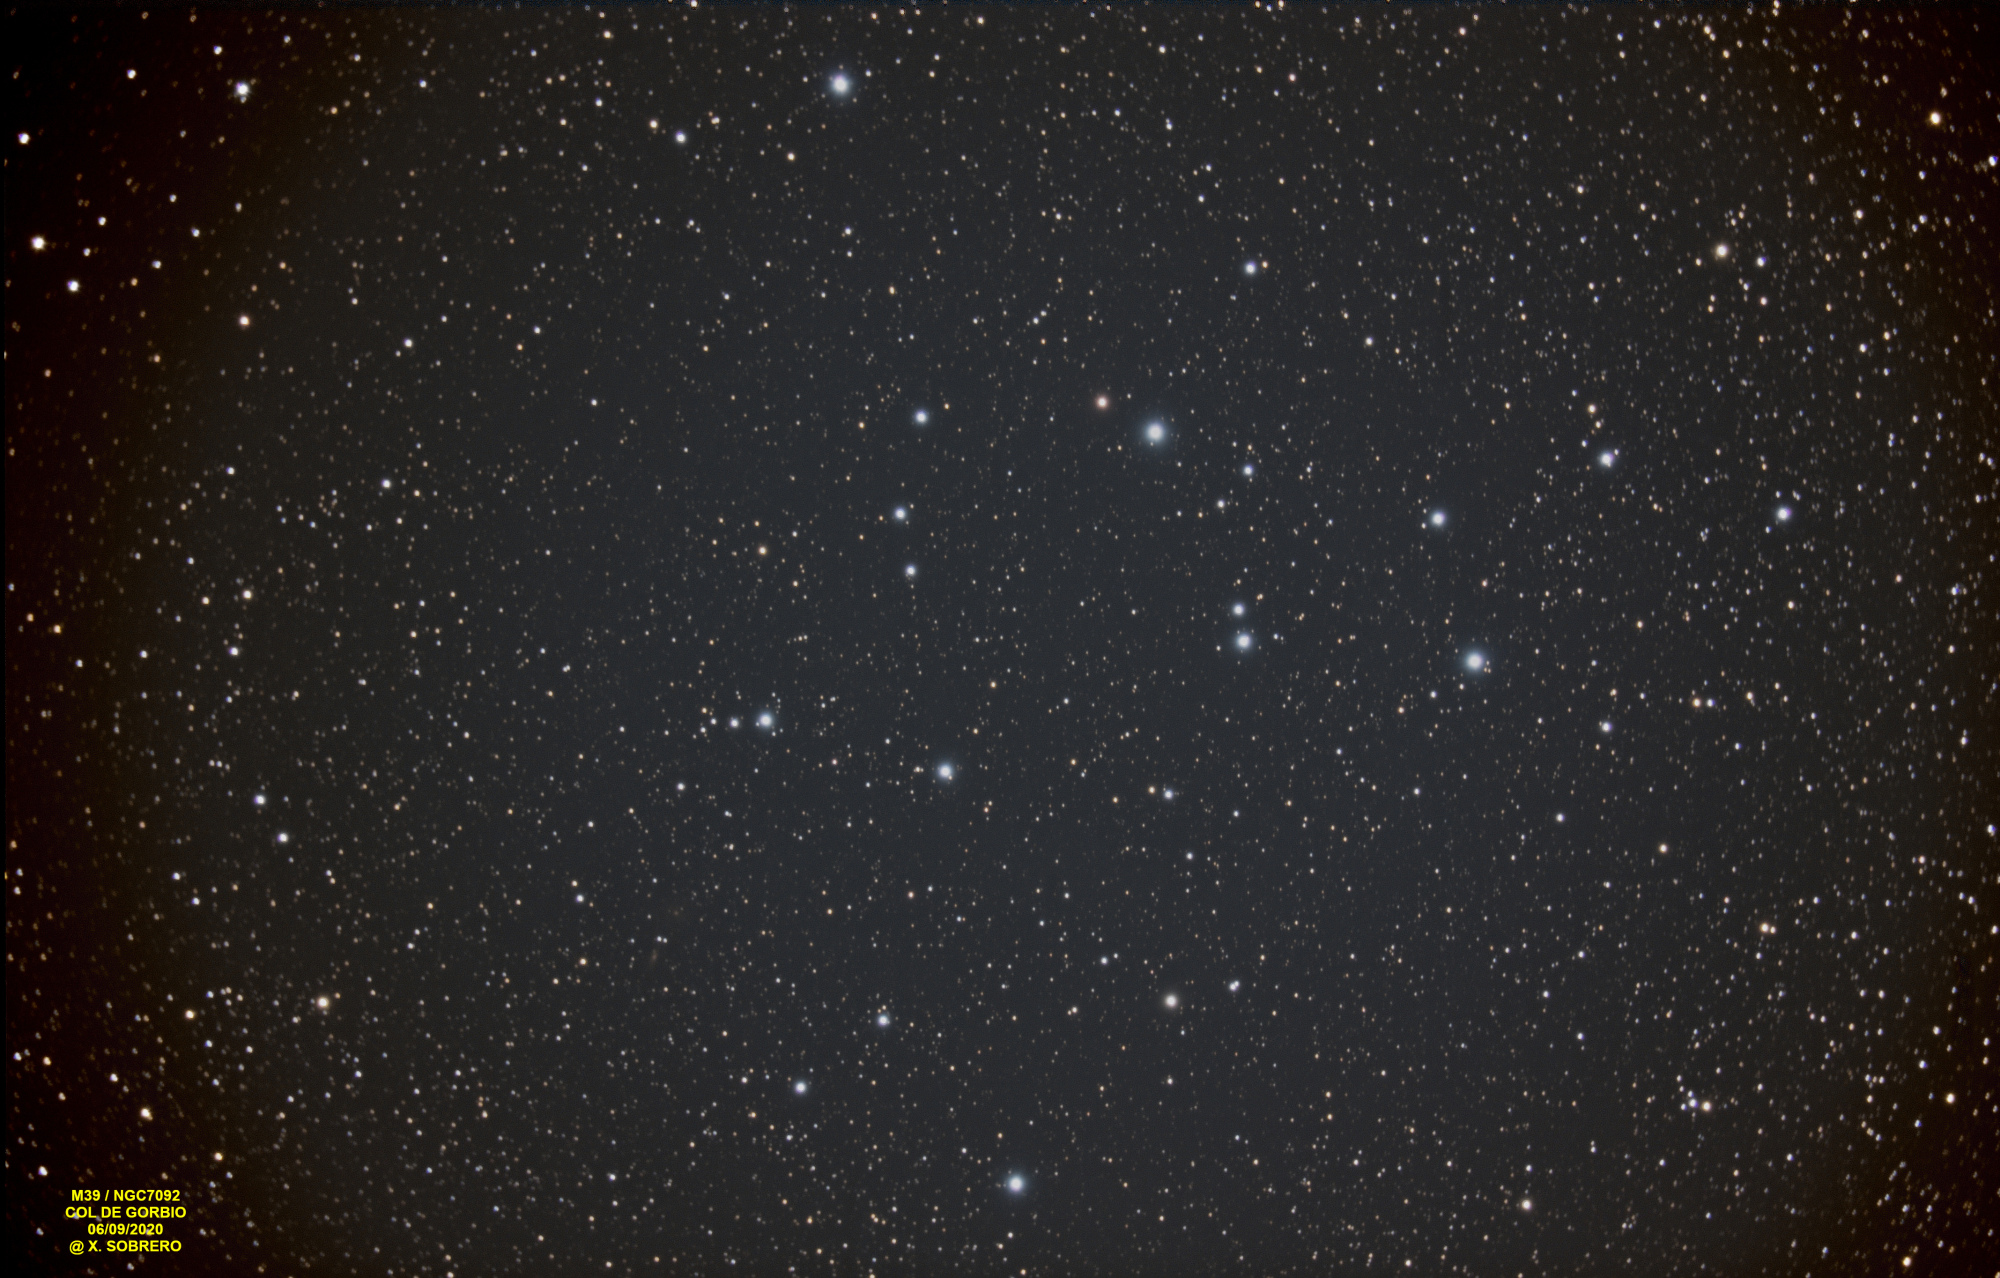 M39__06-09-2020_GORBIO.thumb.jpg.e7004966ec253af14b64d3a5a58d81f7.jpg